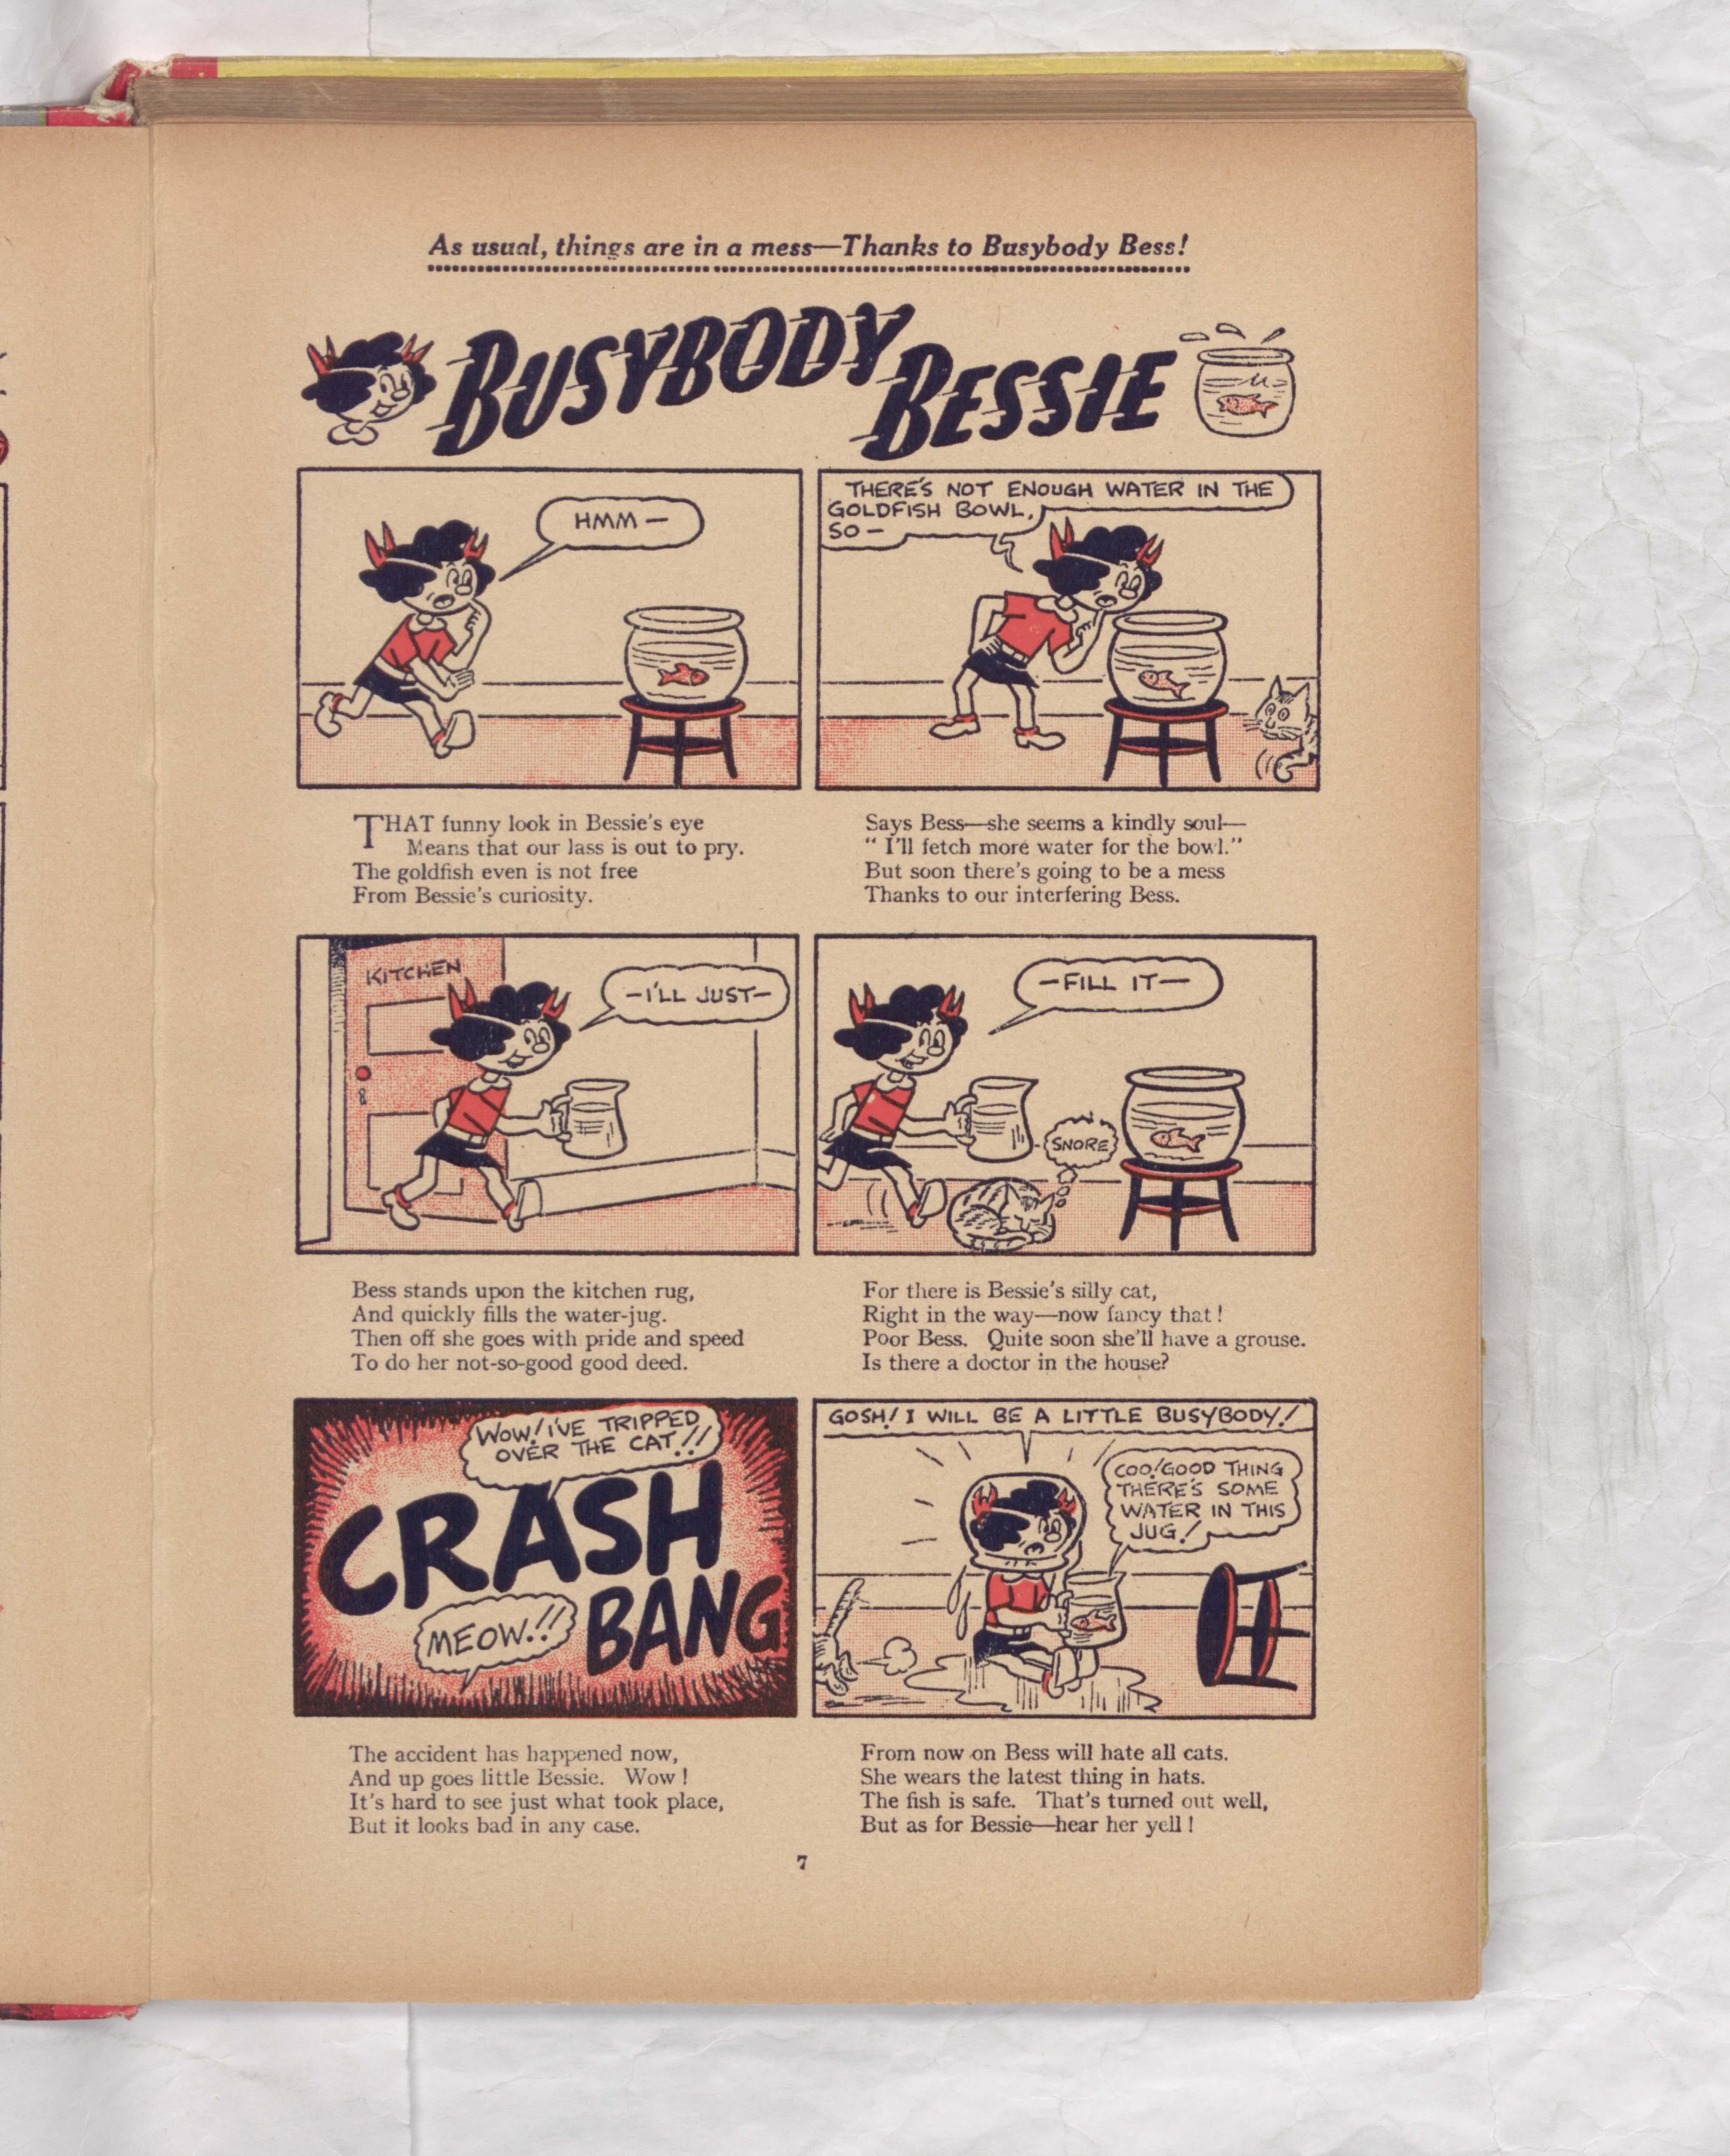 Busybody Bessie - Beano Book 1951 Annual